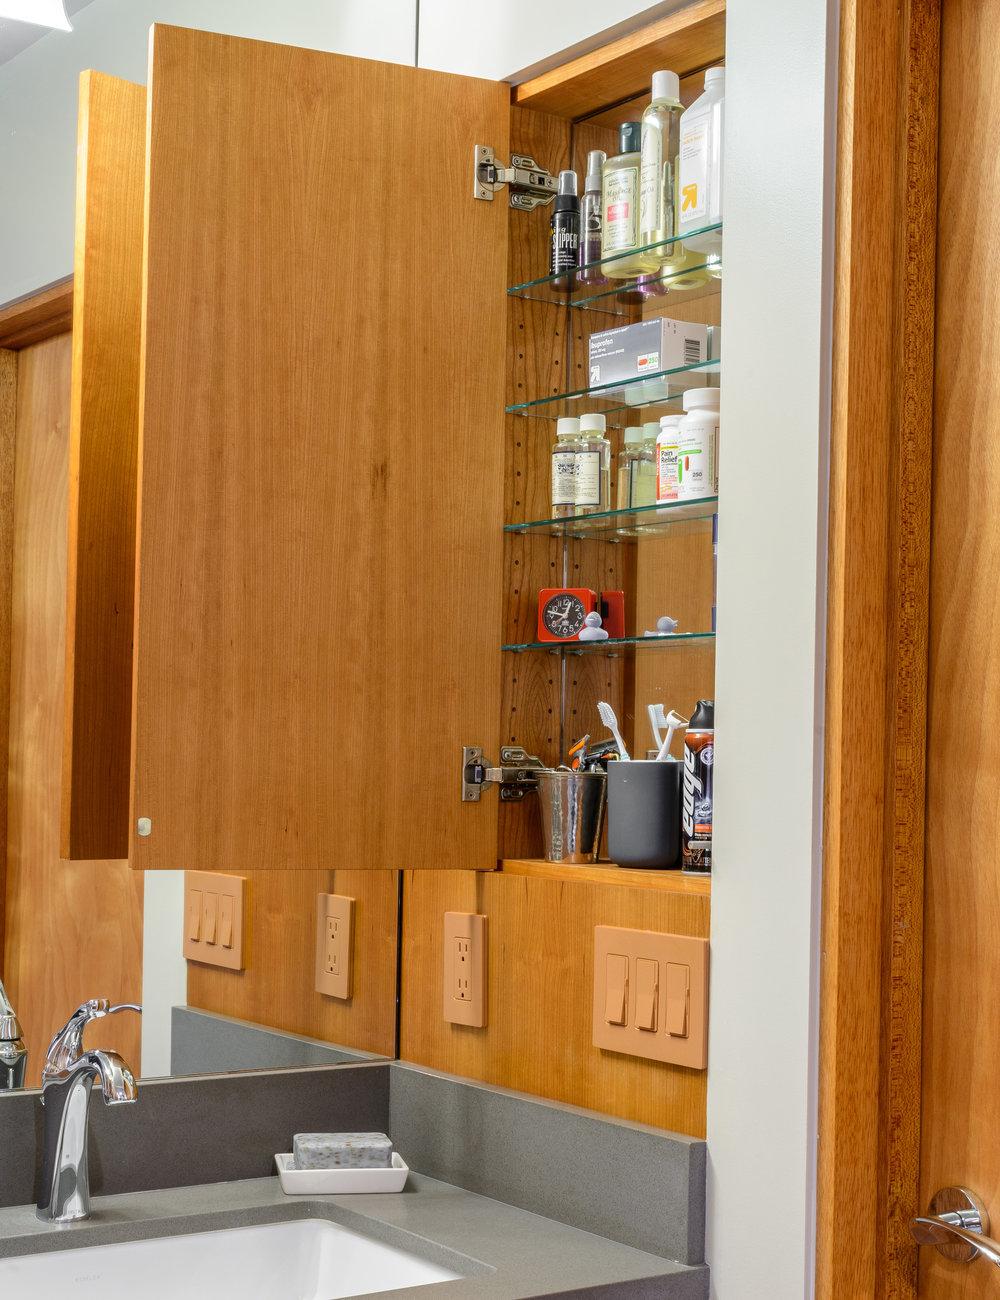 Custom cherry medicine cabinet built into wood wall